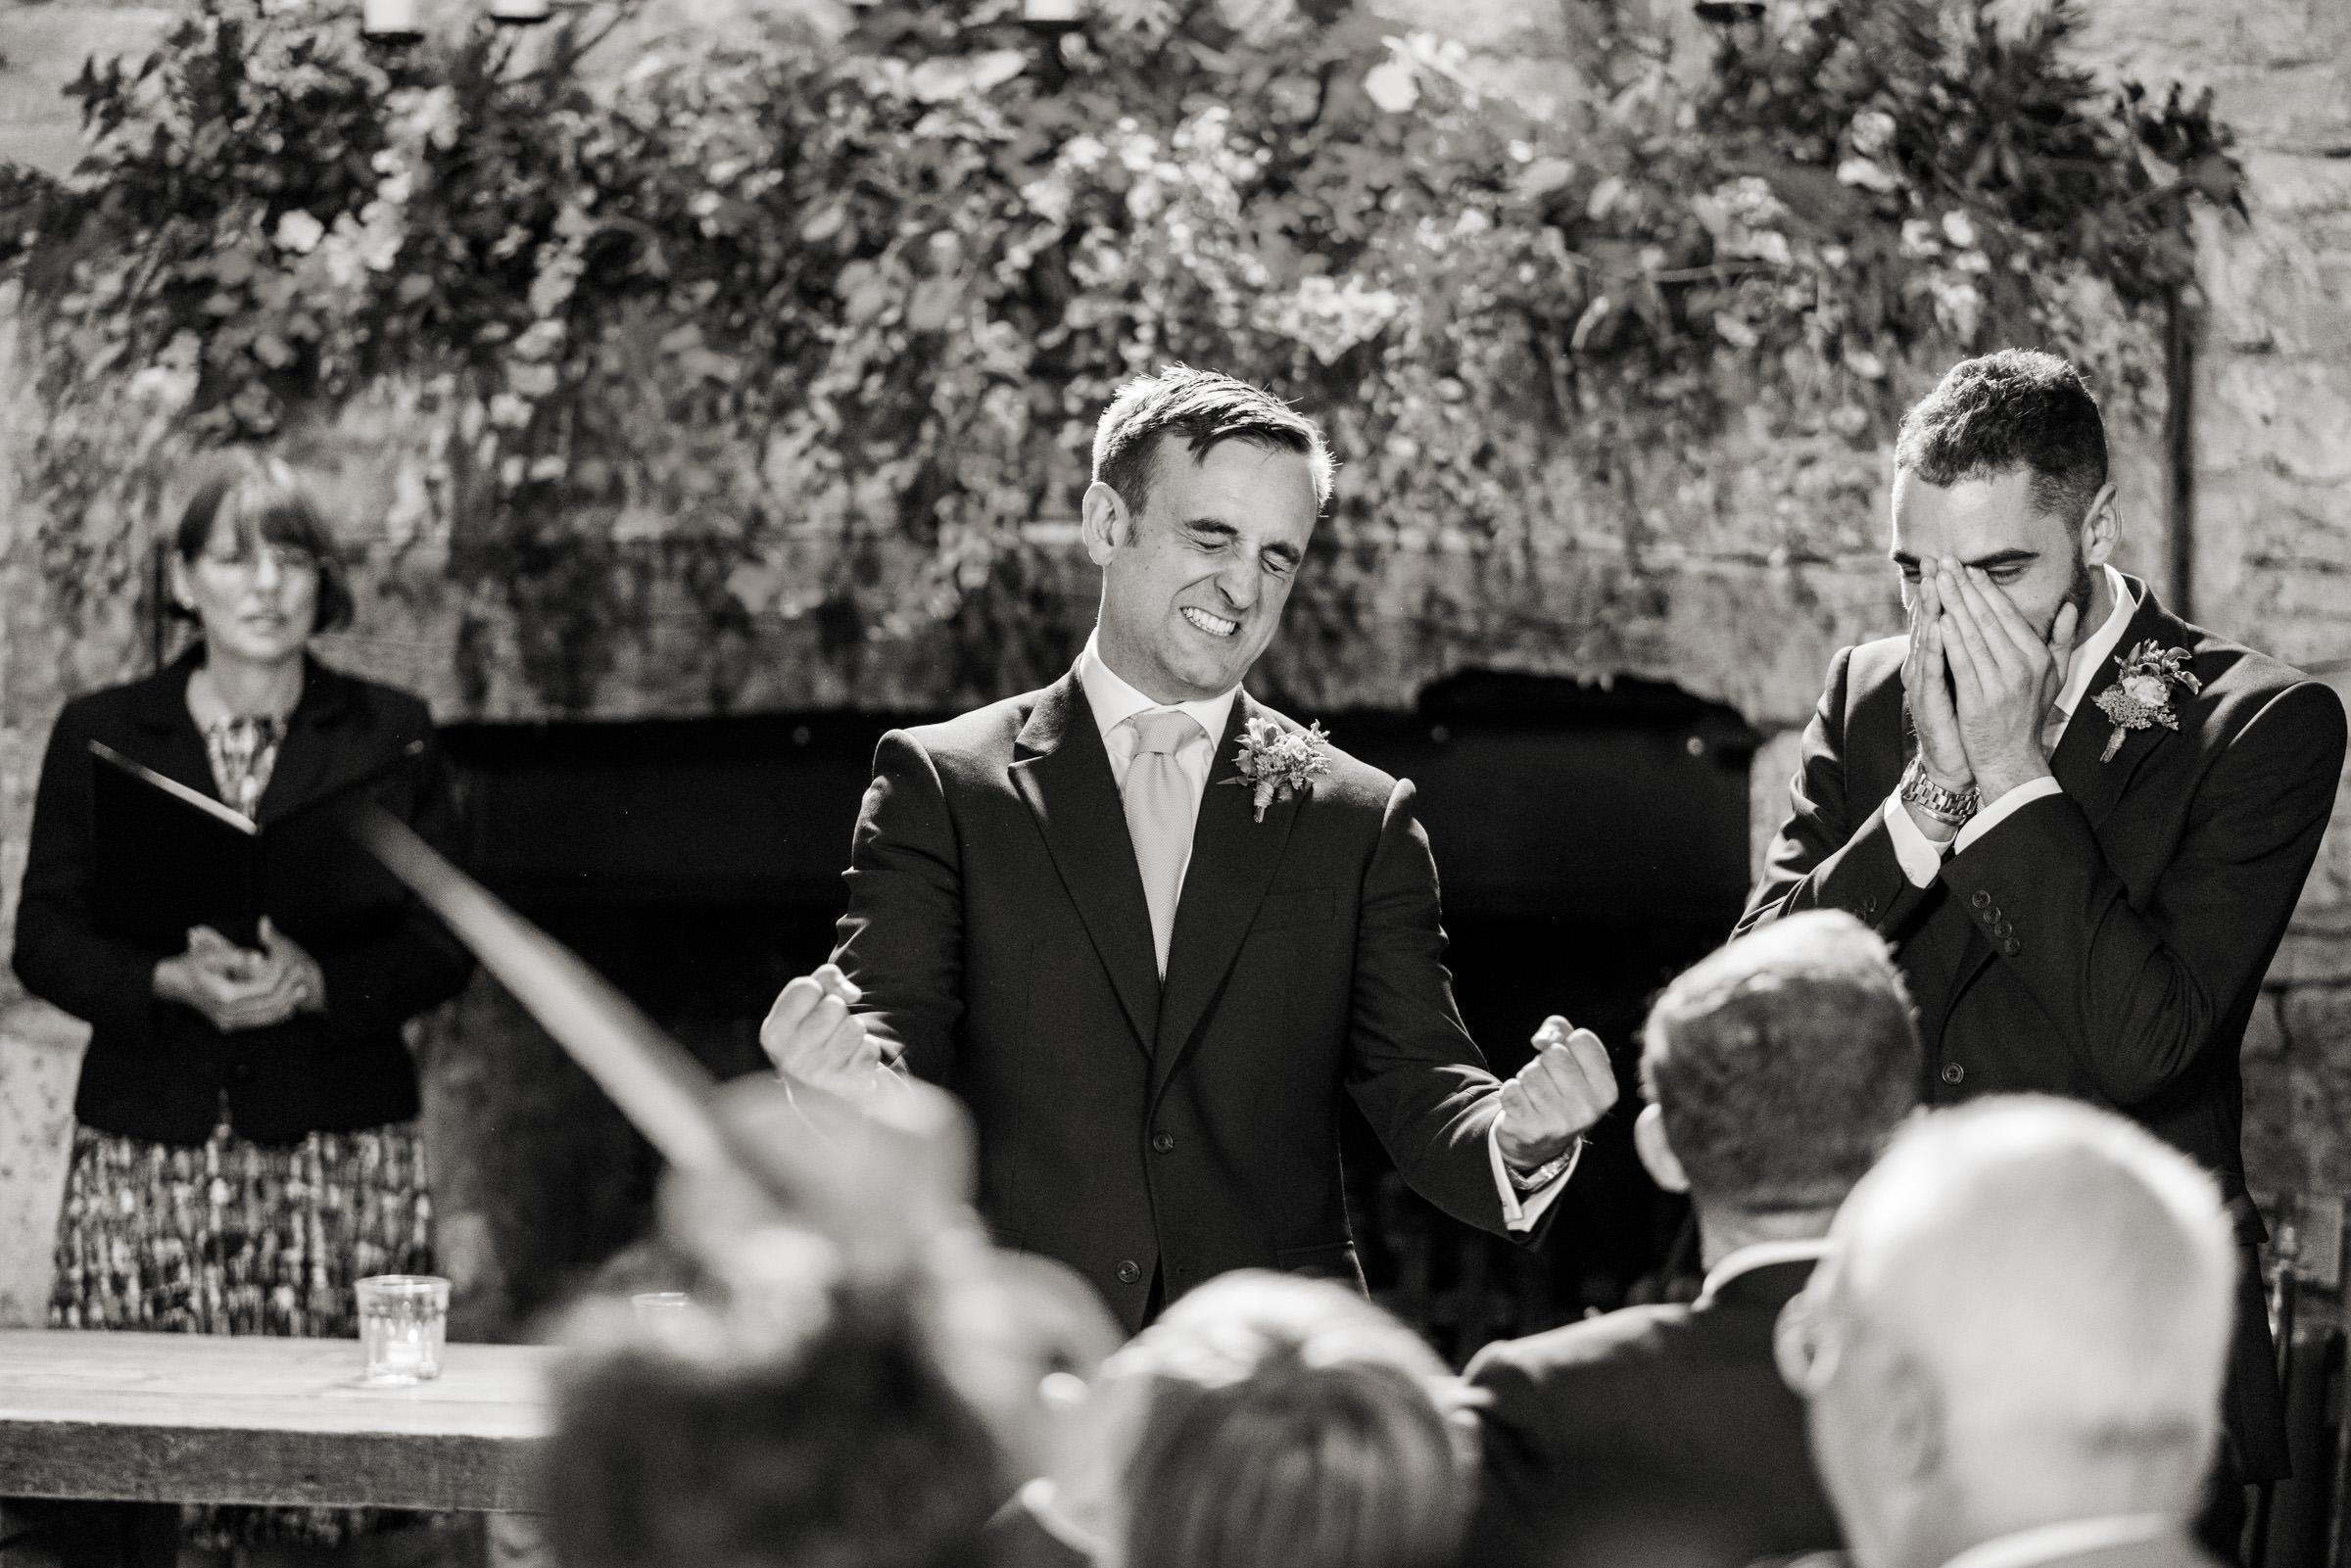 Cripps Barn Bibury Cotswolds Wedding Photography 006.jpg